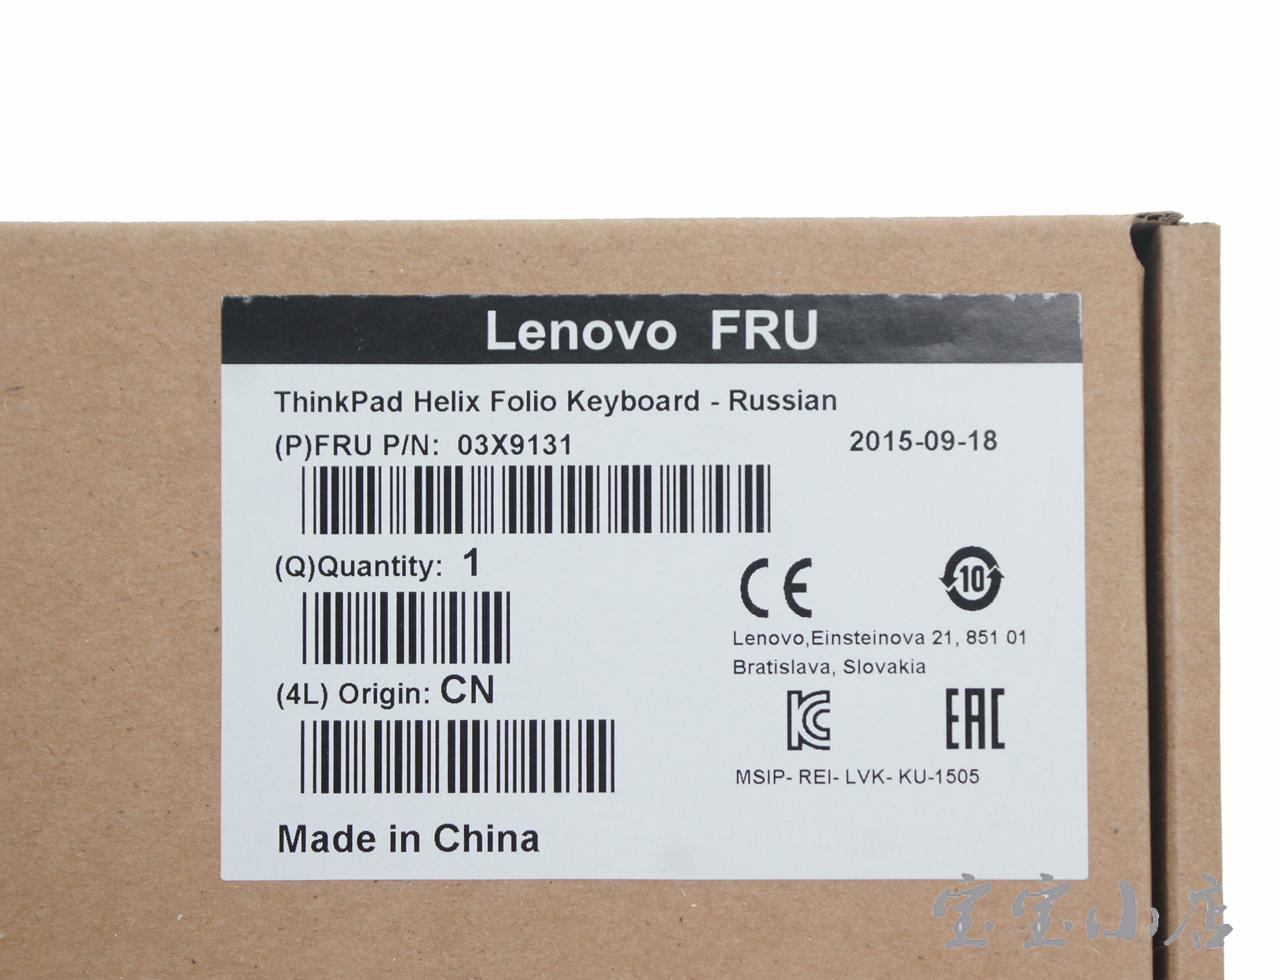 Original New Russian RU Folio Keyboard for Laptop Lenovo ThinkPad Helix Gen 2 Folio Touch Keyboard Leather Case 03x9131 键盘